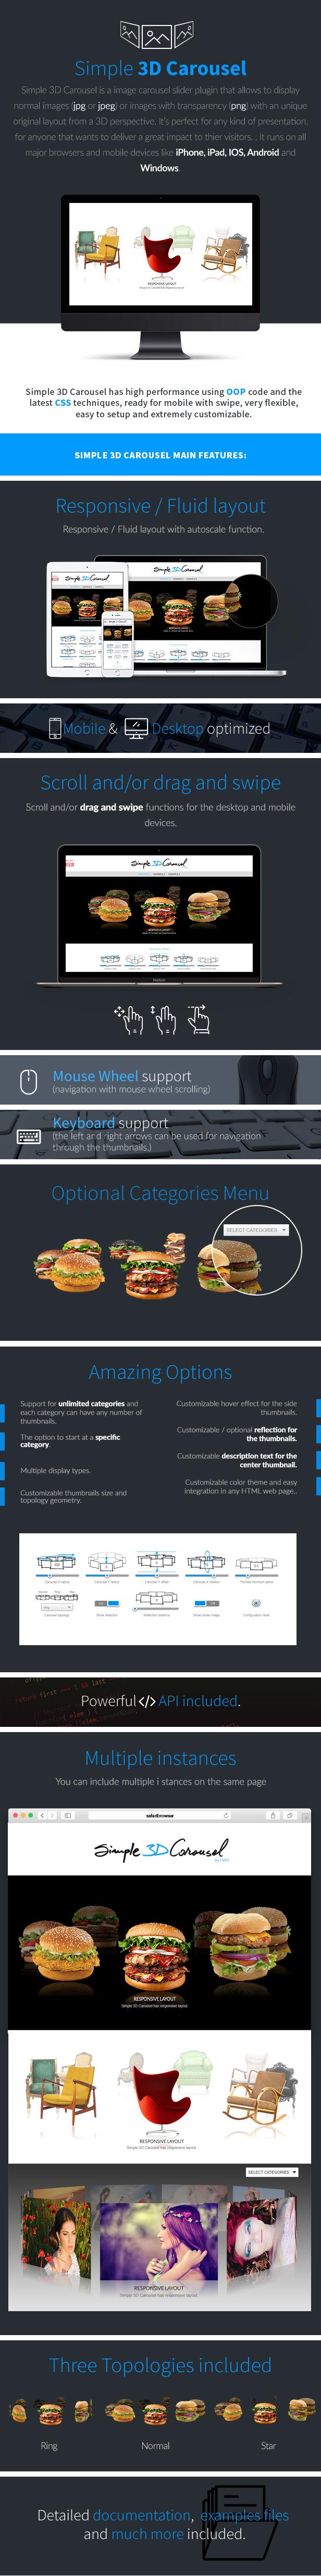 Simple 3D Carousel WordPress Plugin - 6